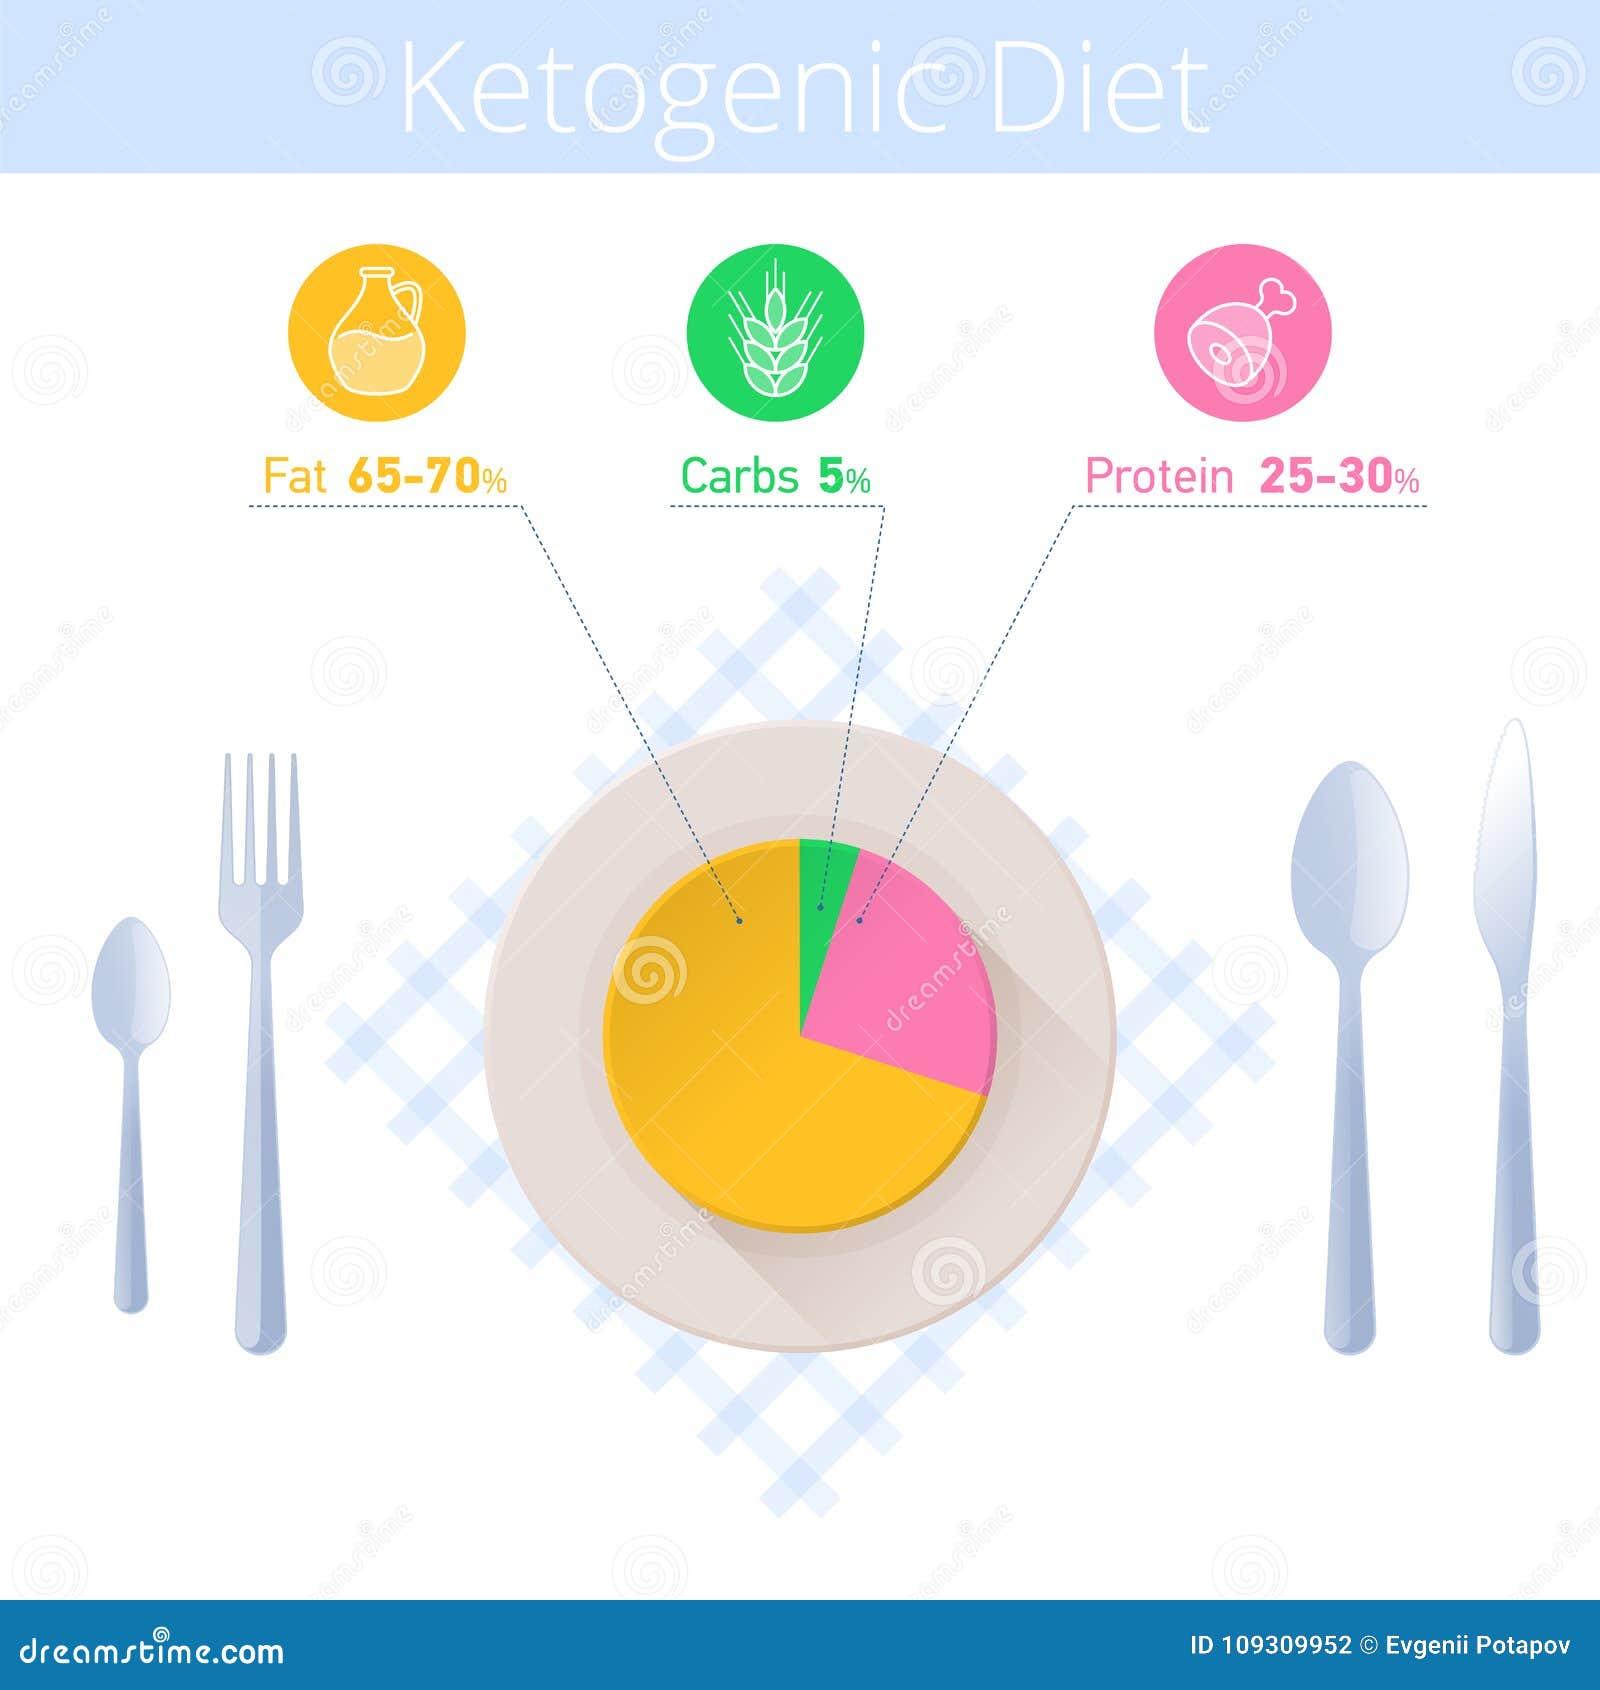 Keto Diet Infographic Kitchen Utensil Ketogenic Diagram Manual Guide